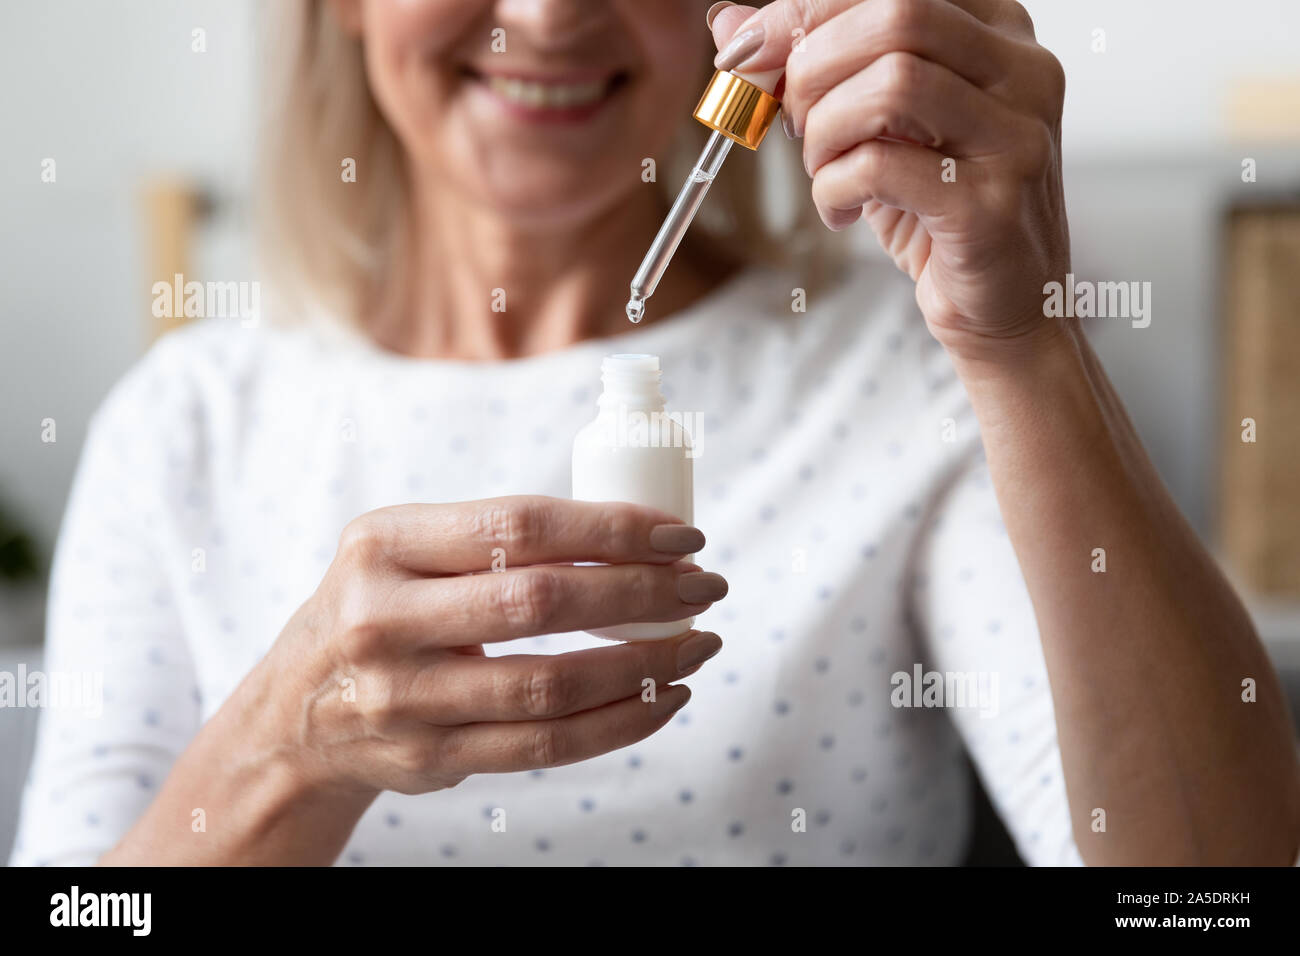 Gerne reife Frau mit Gesicht Skin Care Serum, Nahaufnahme Stockfoto